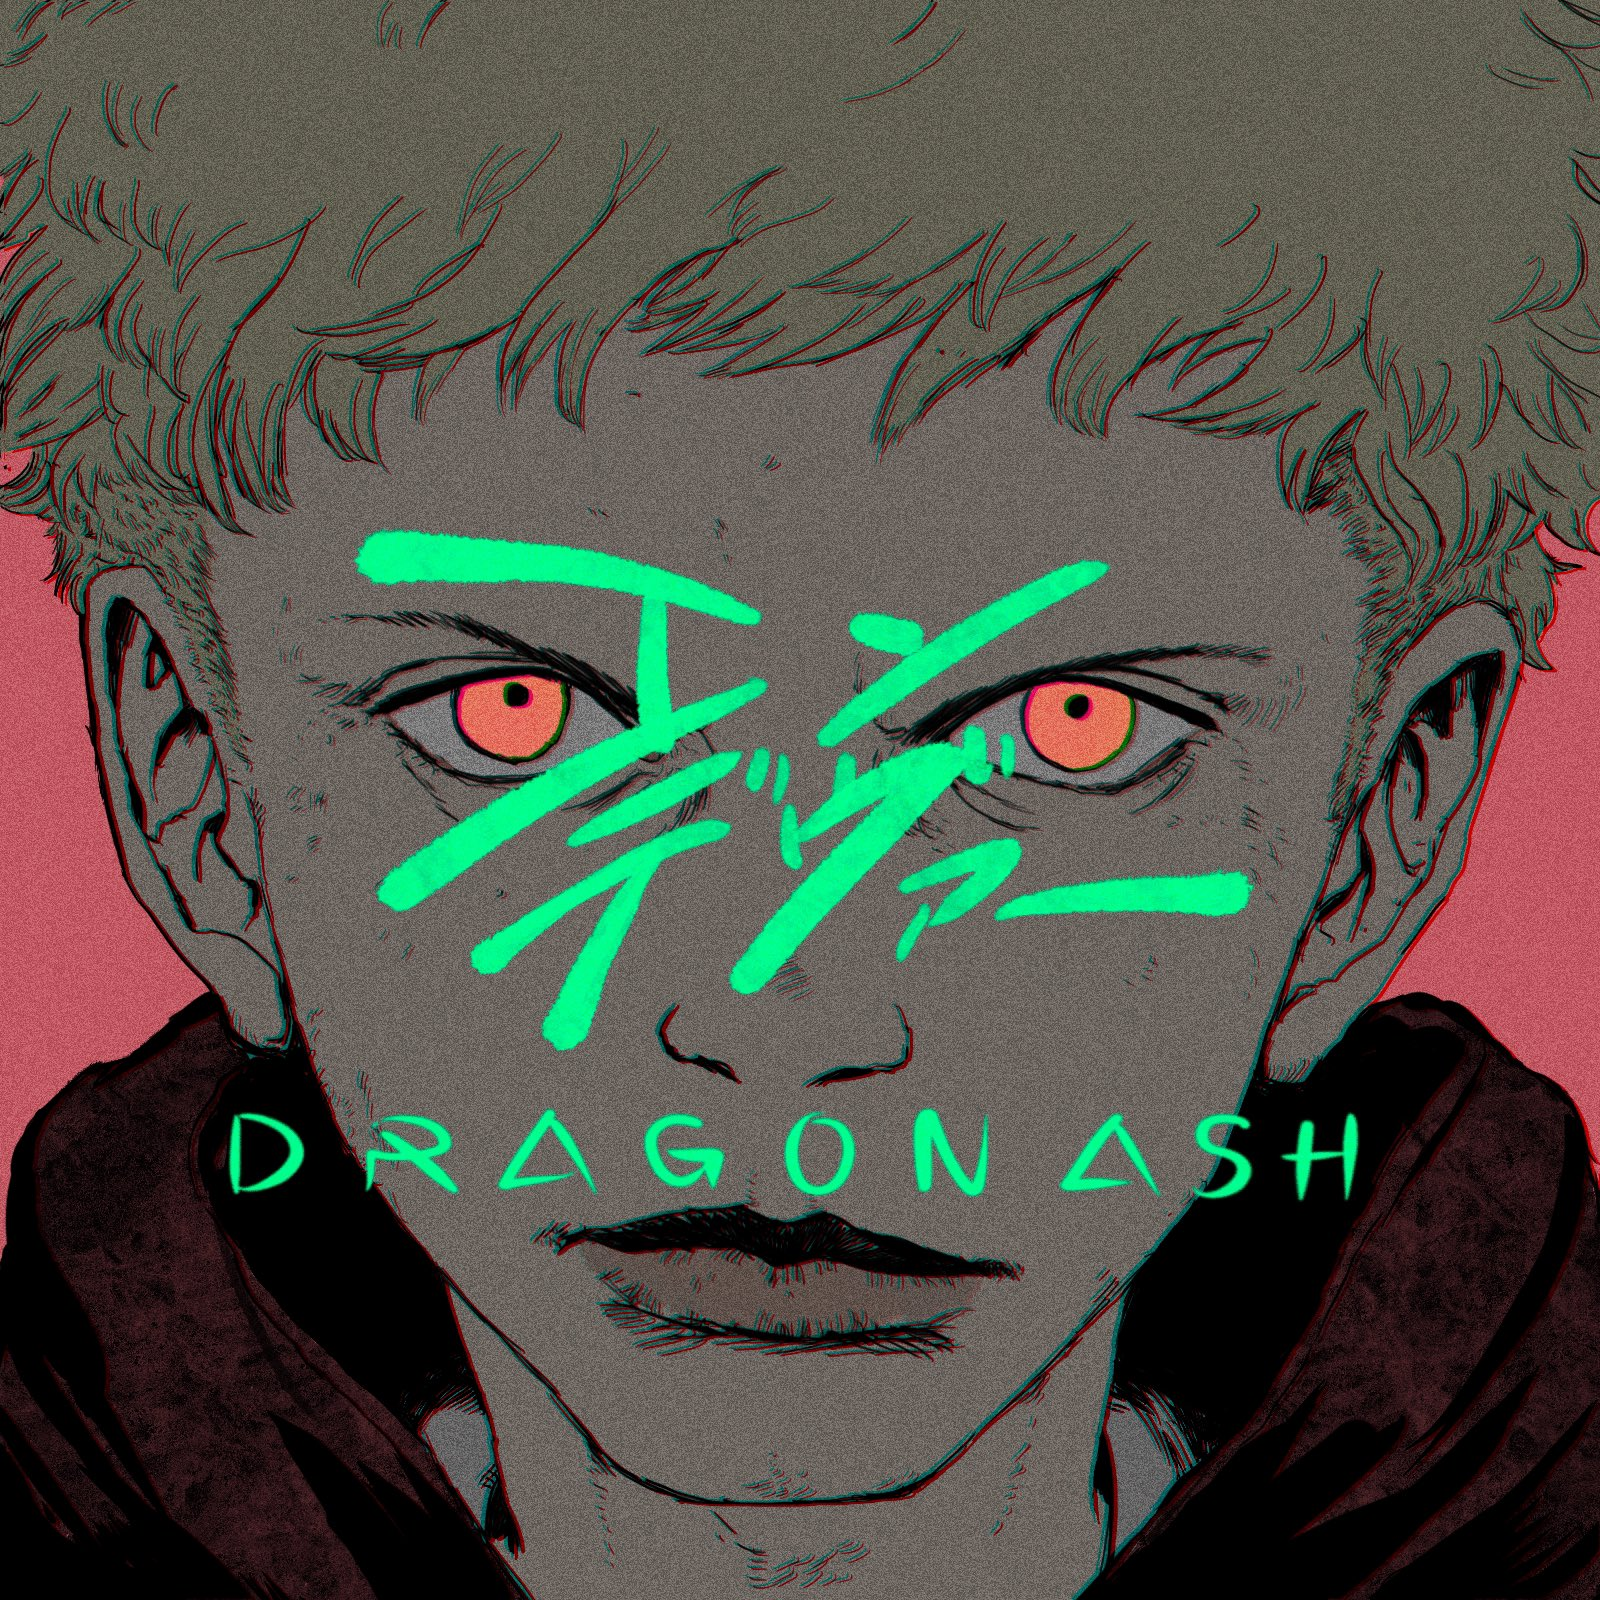 Dragon Ash - エンデヴァー [2021.04.14+MP3+RAR]